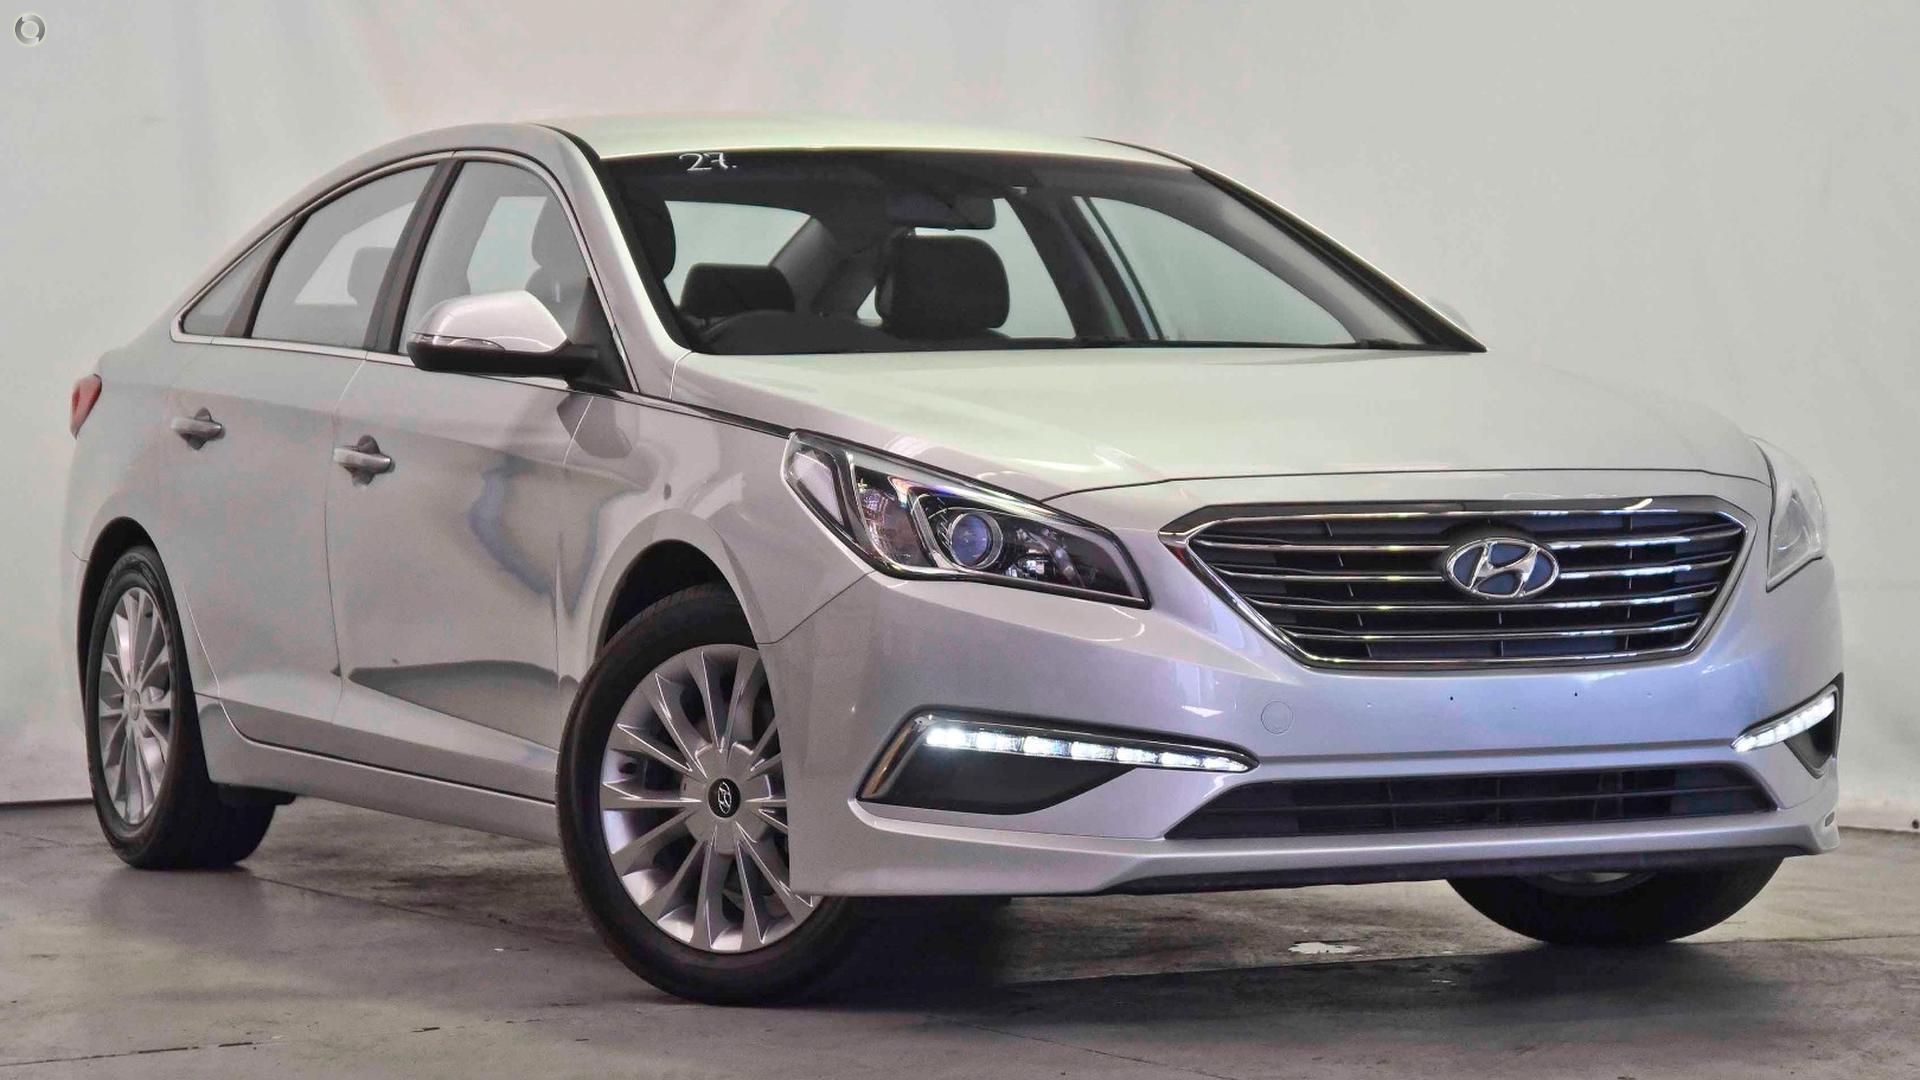 2016 Hyundai Sonata Active LF